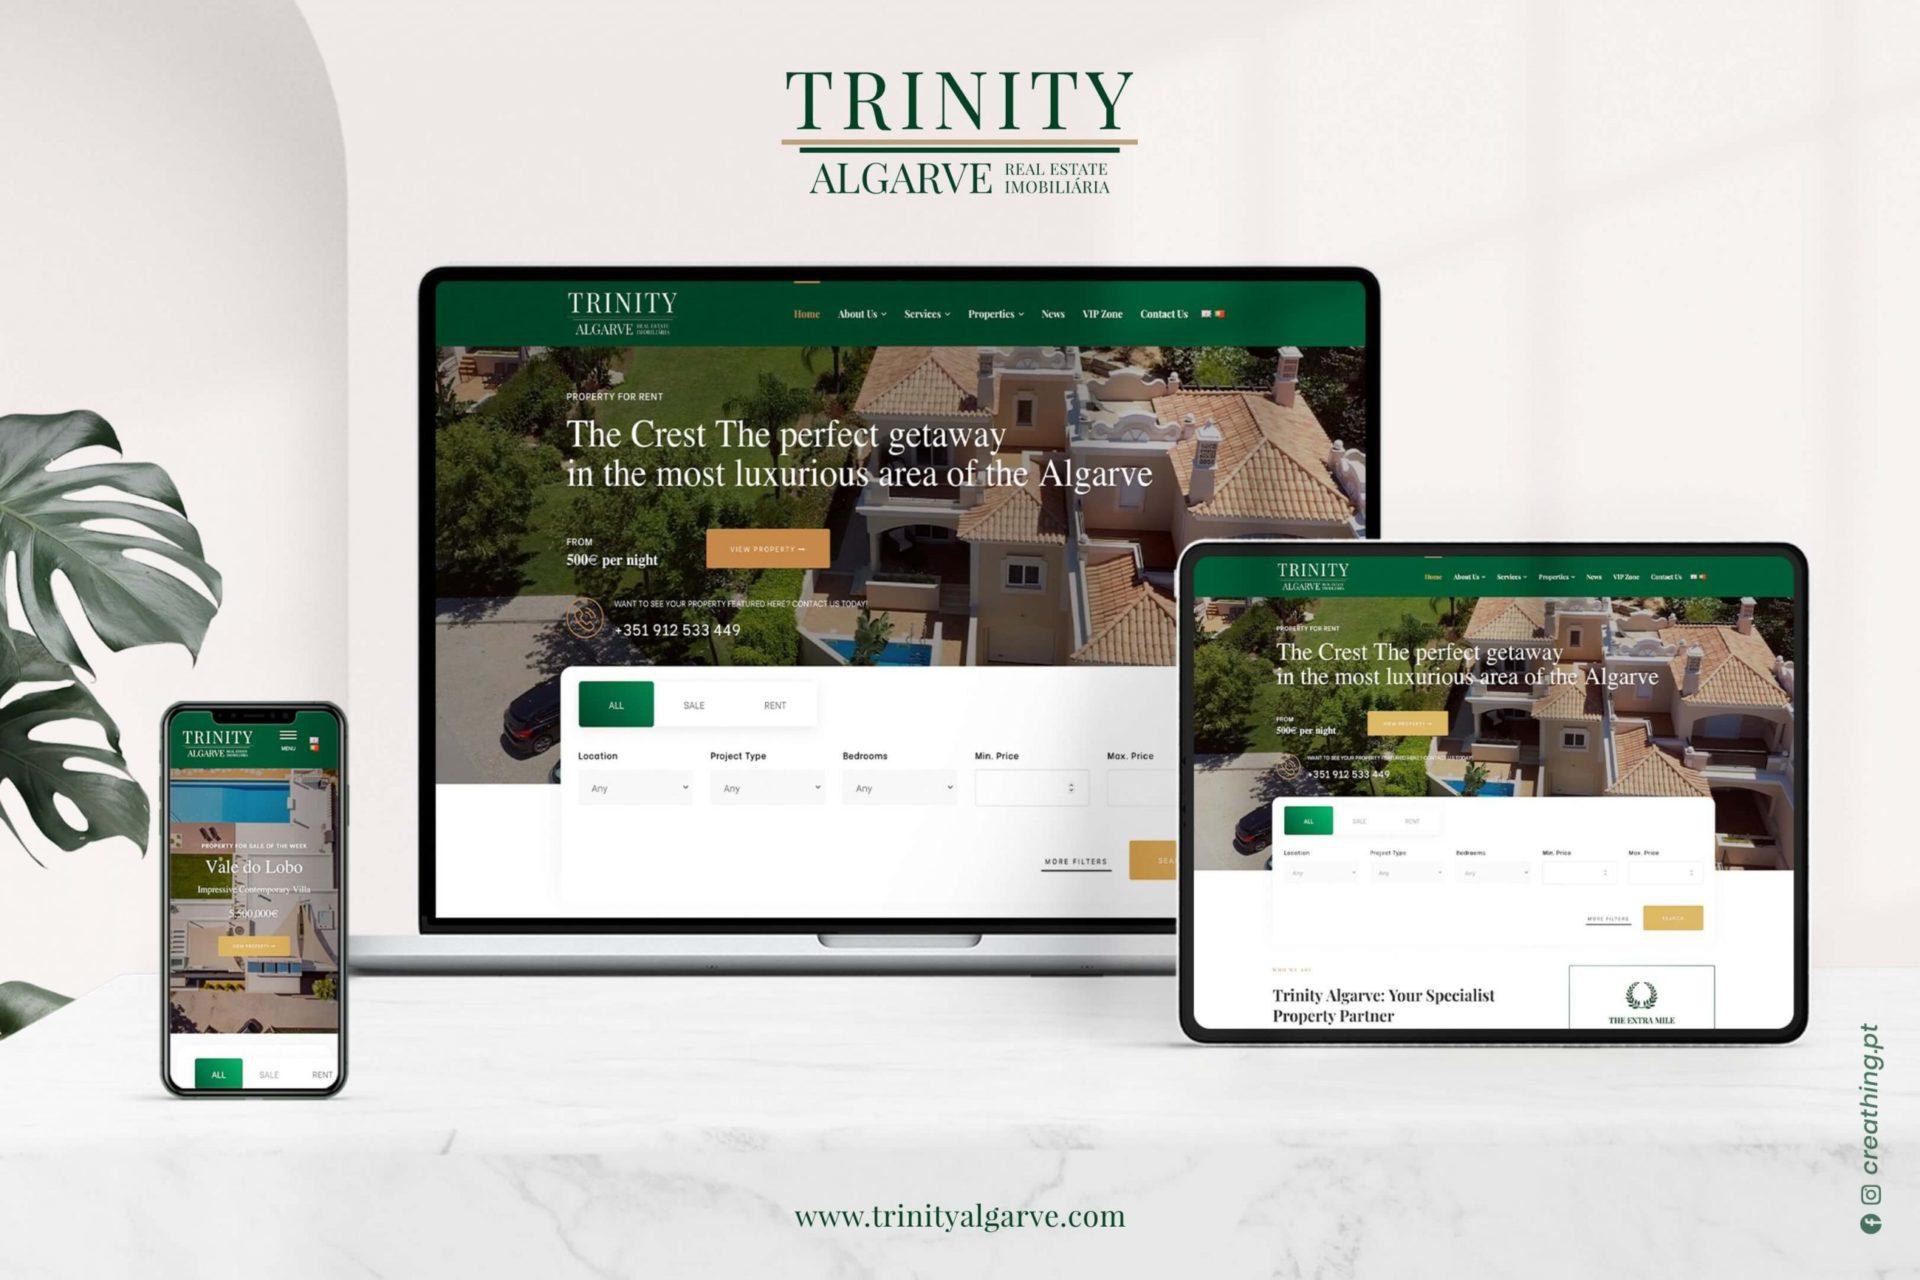 Trinity Algarve